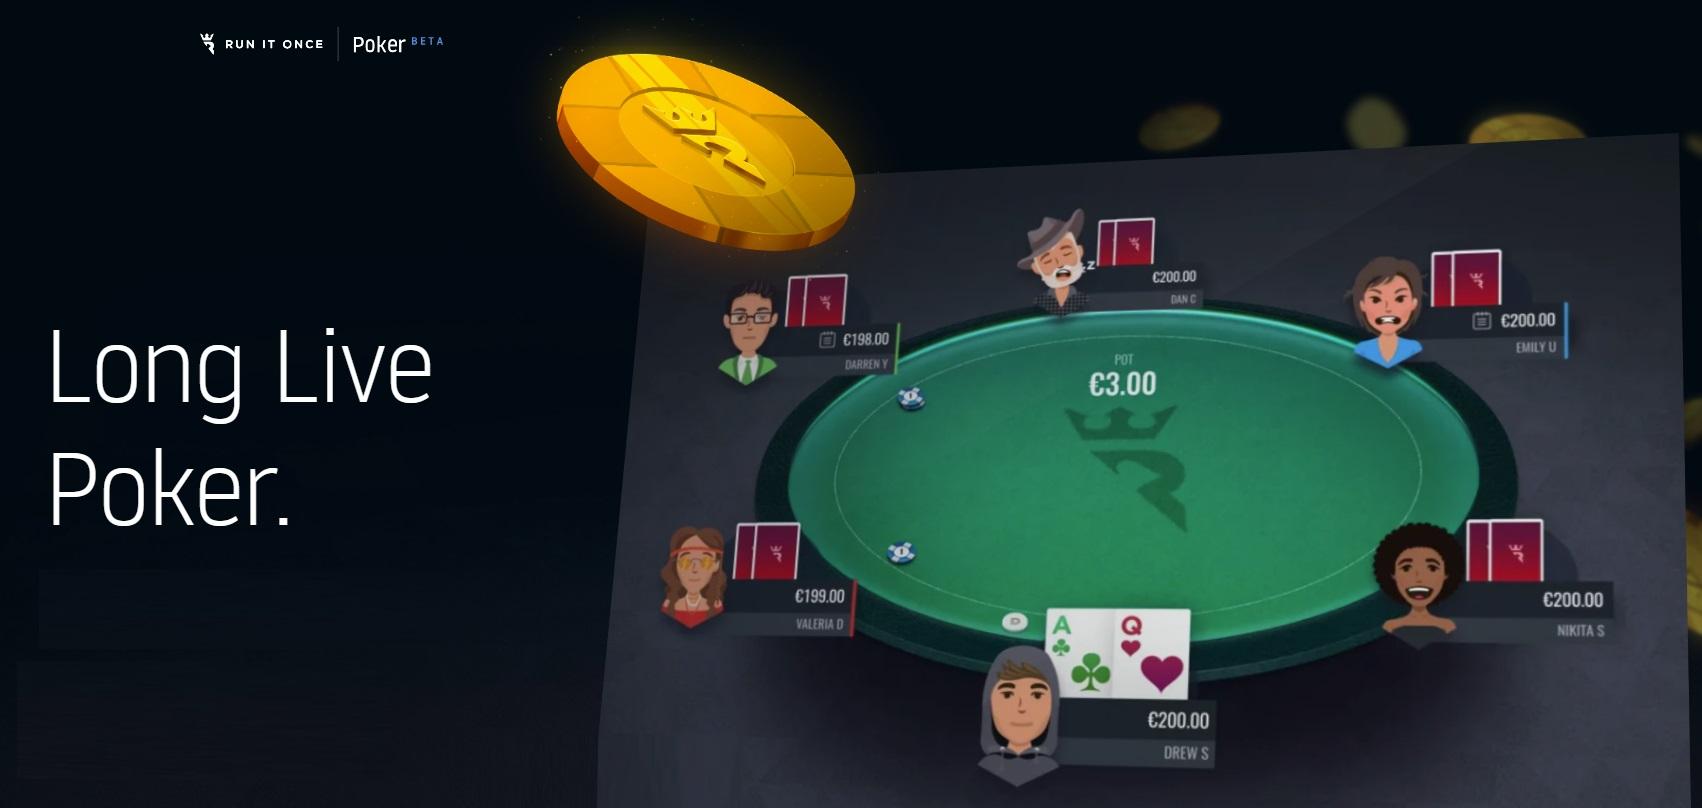 Плюсы и минусы Run It Once Poker